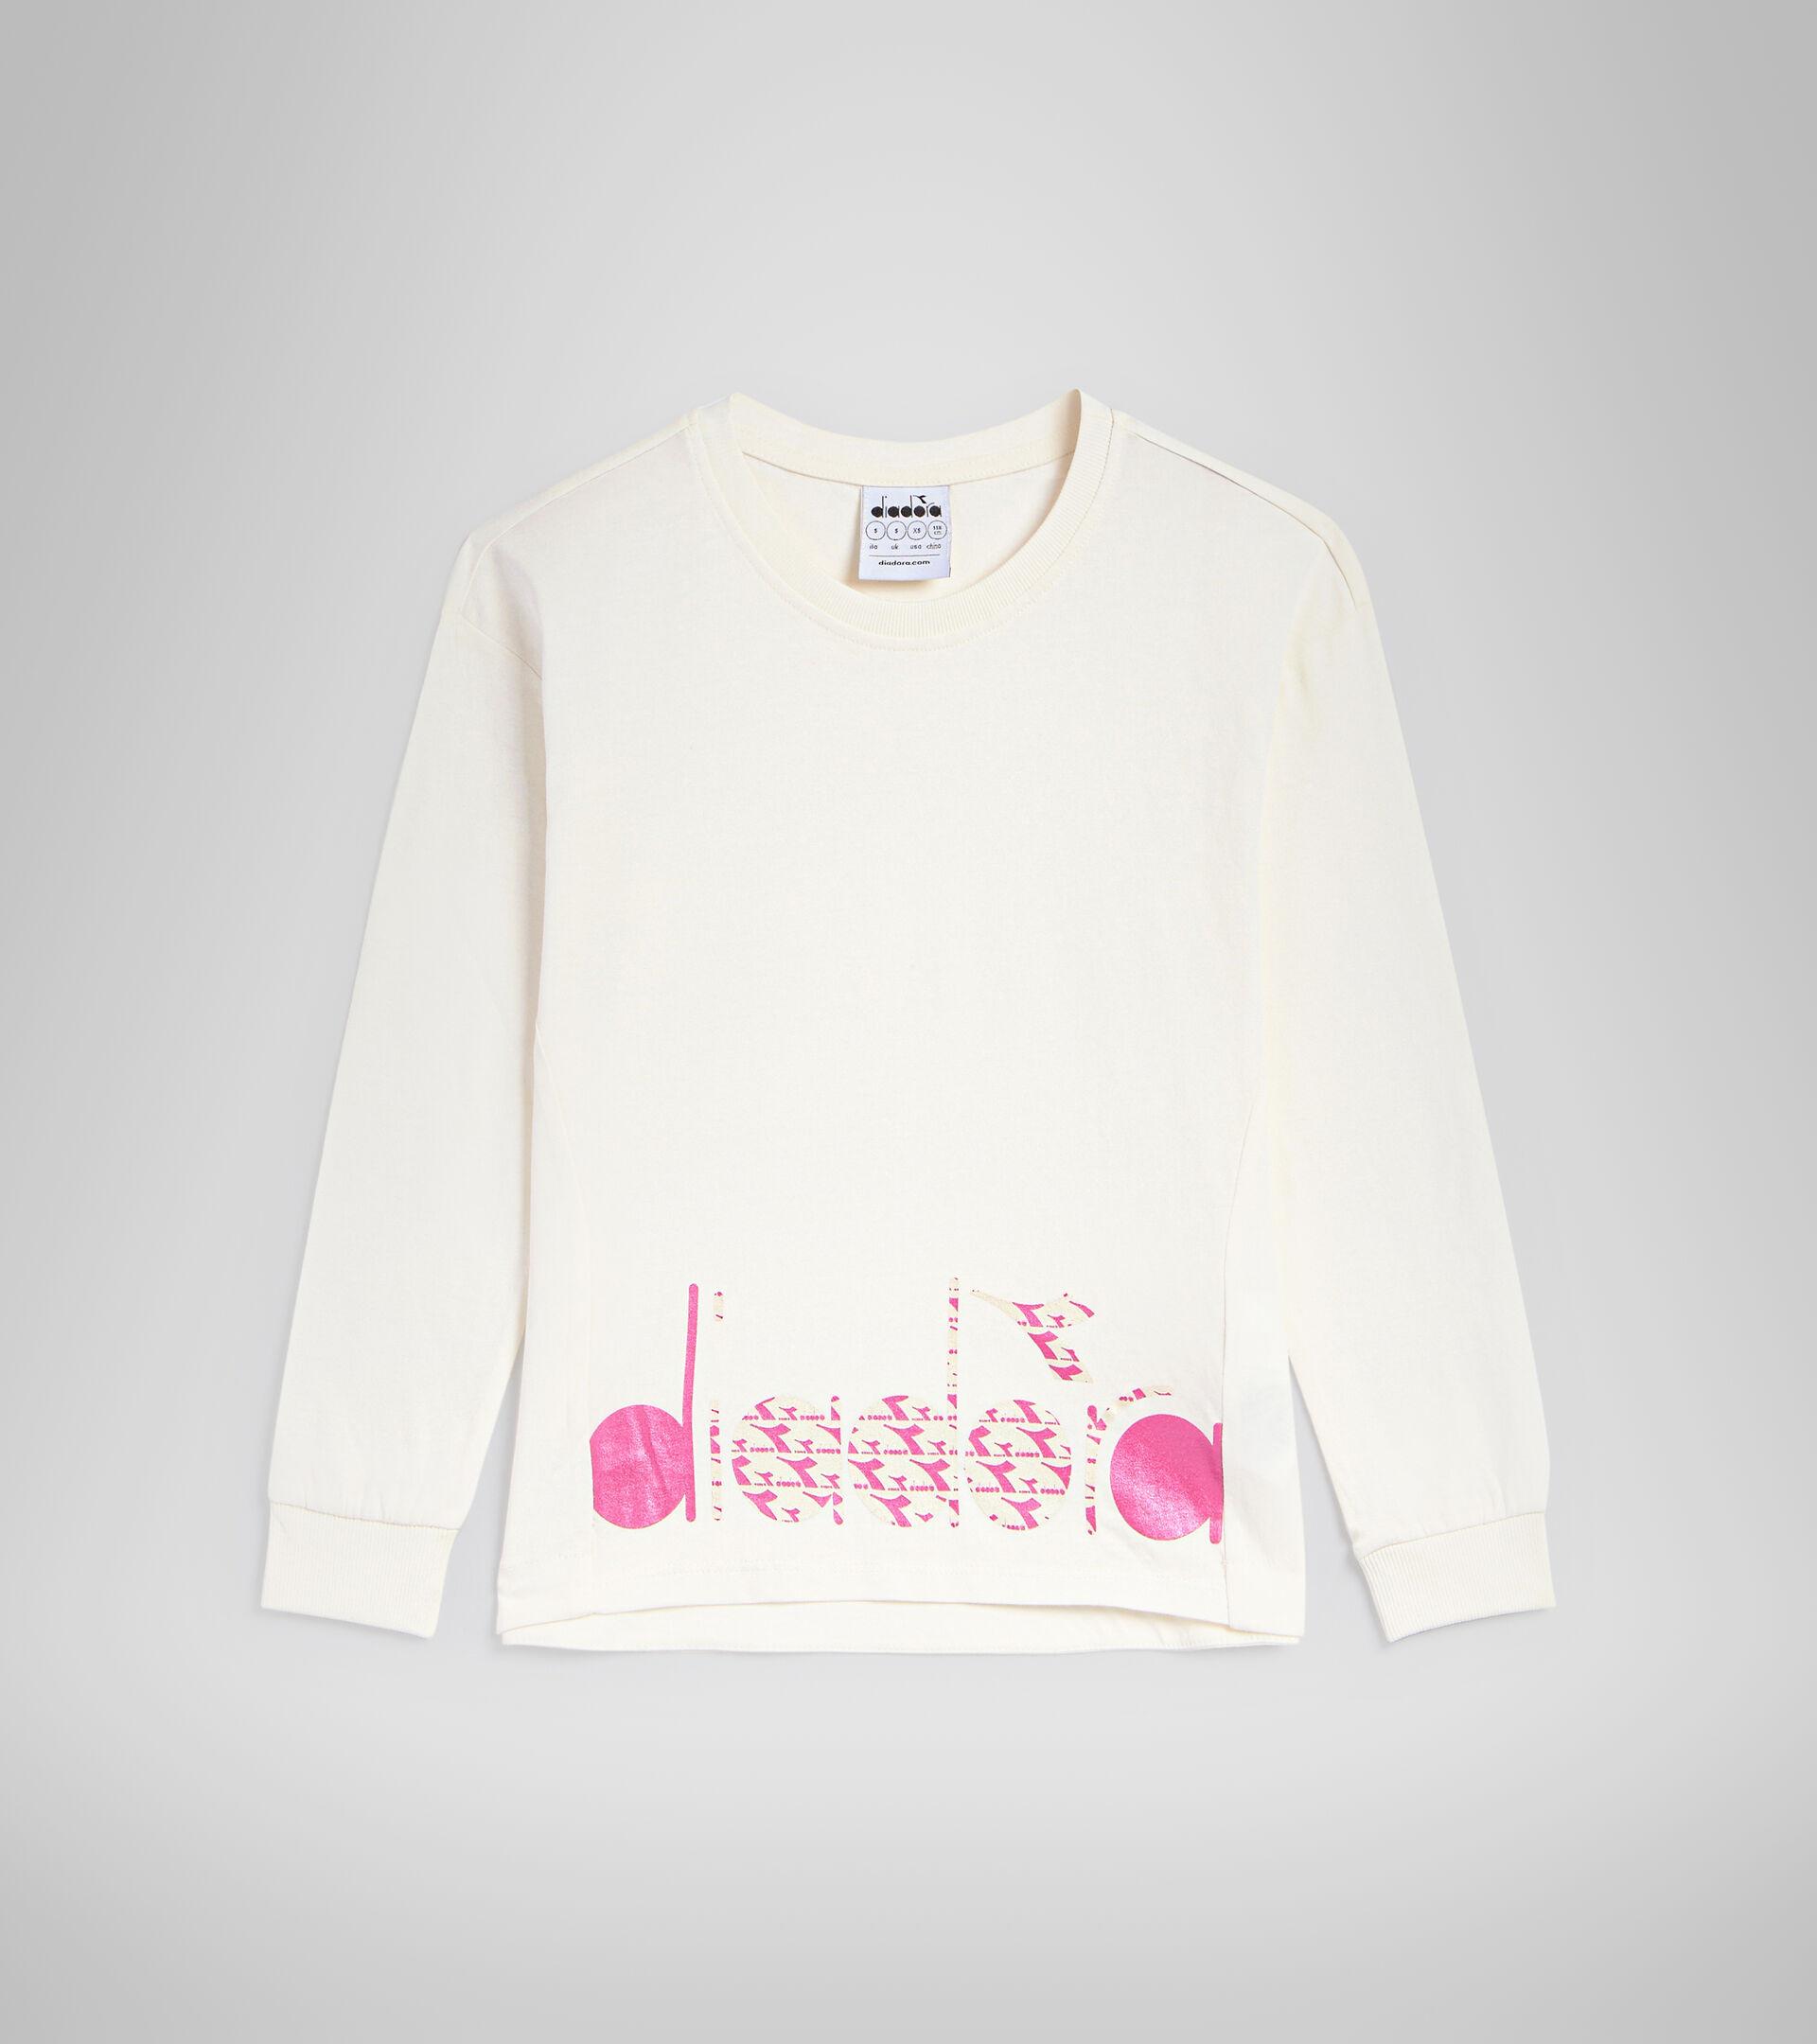 Long-sleeved T-shirt - Kids JG.T-SHIRT LS TWINKLE WHISPER WHITE - Diadora